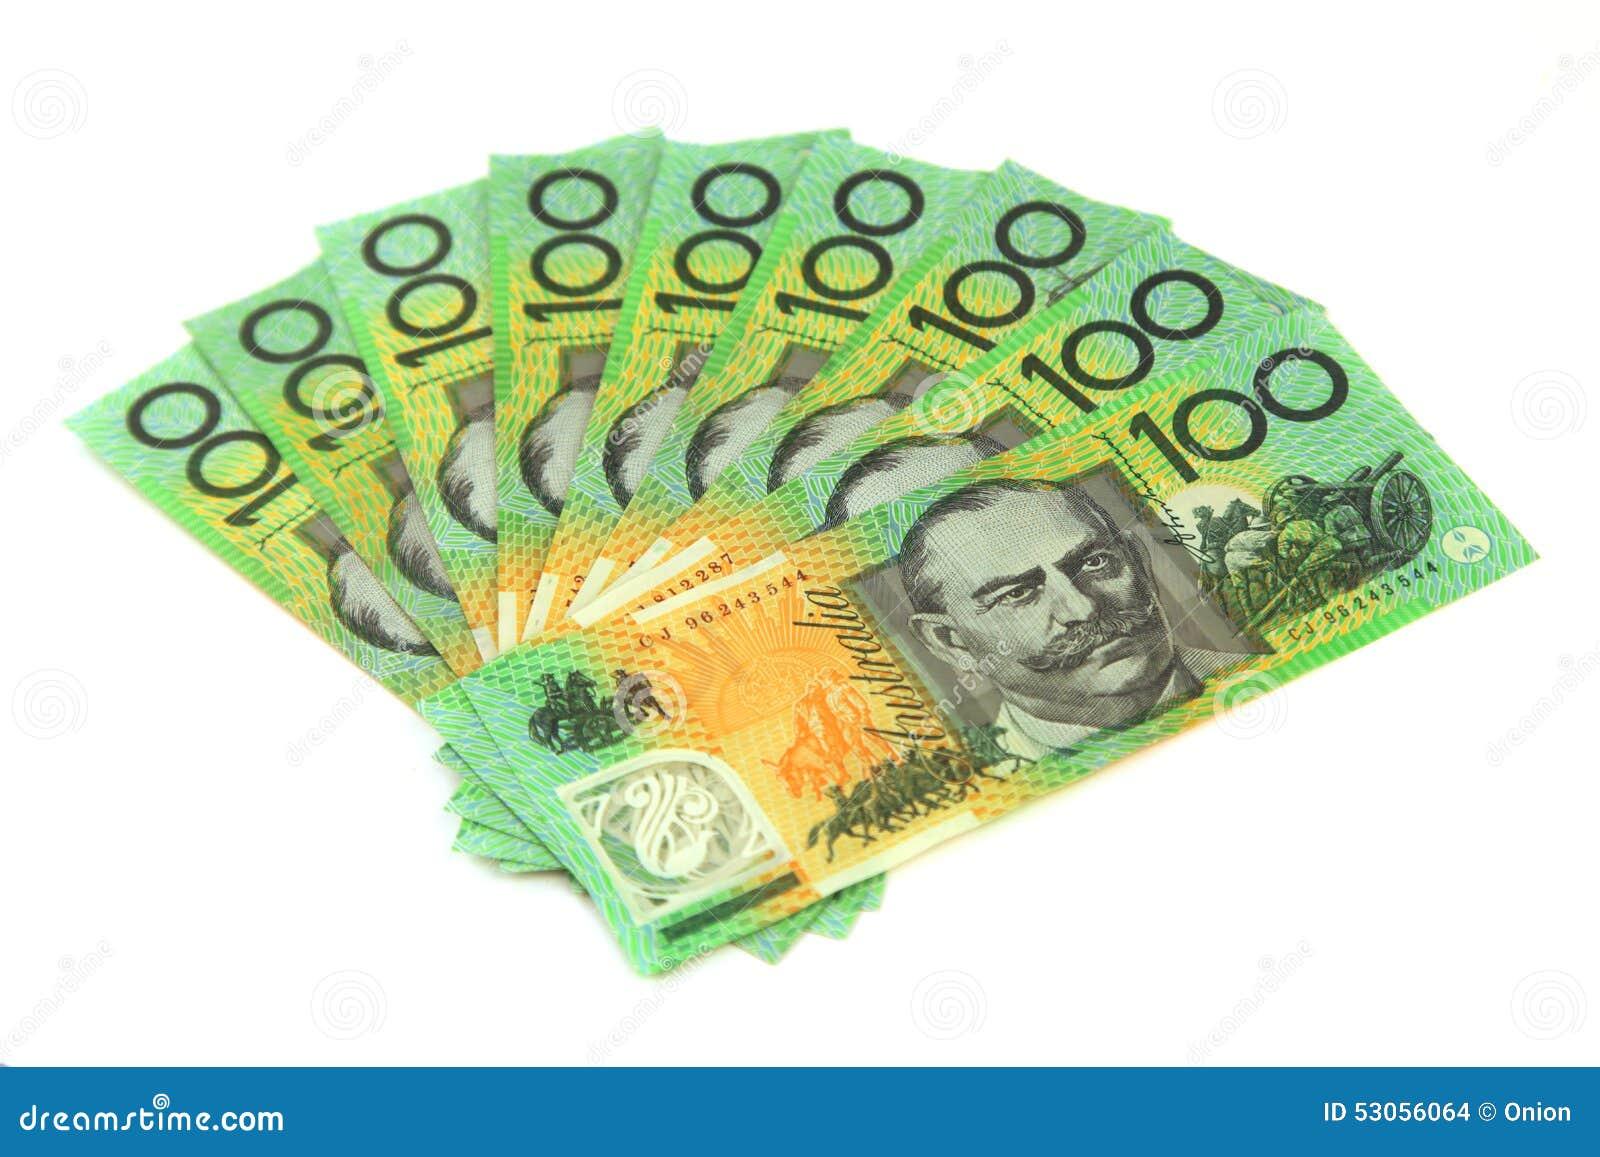 how to get money in australia